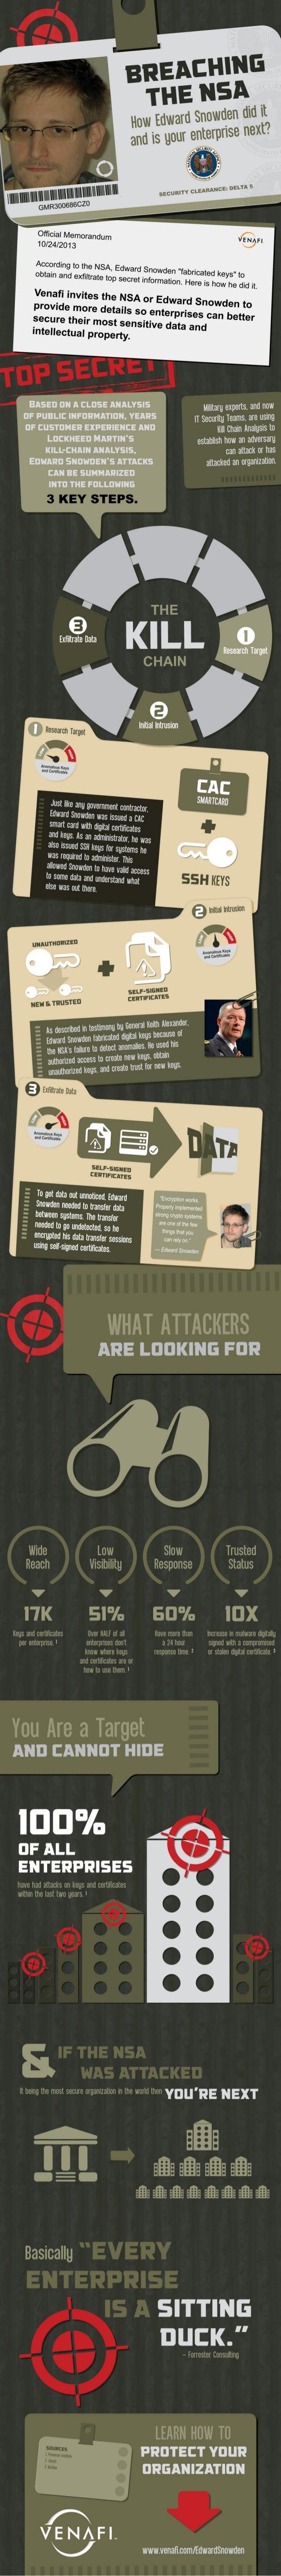 Breaching the NSA Graphic